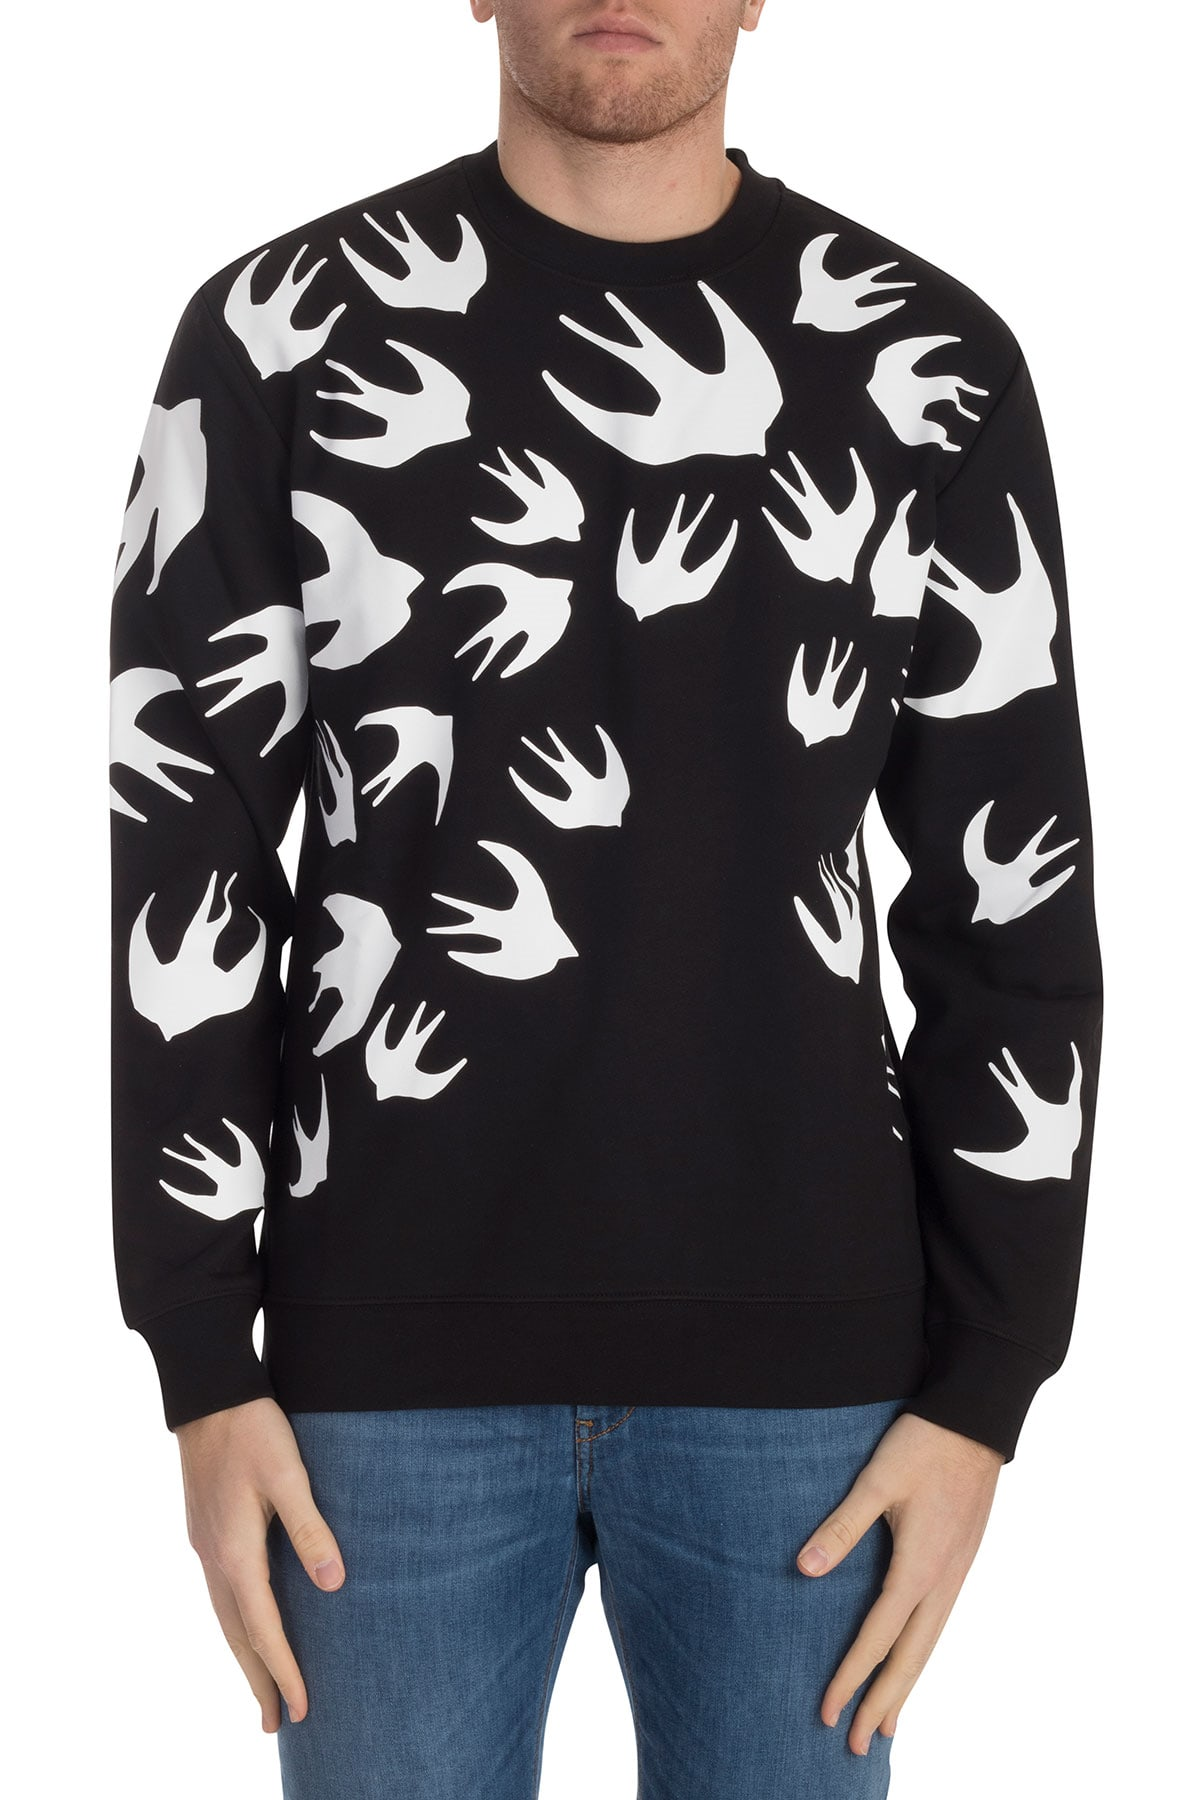 McQ Alexander McQueen Sweater